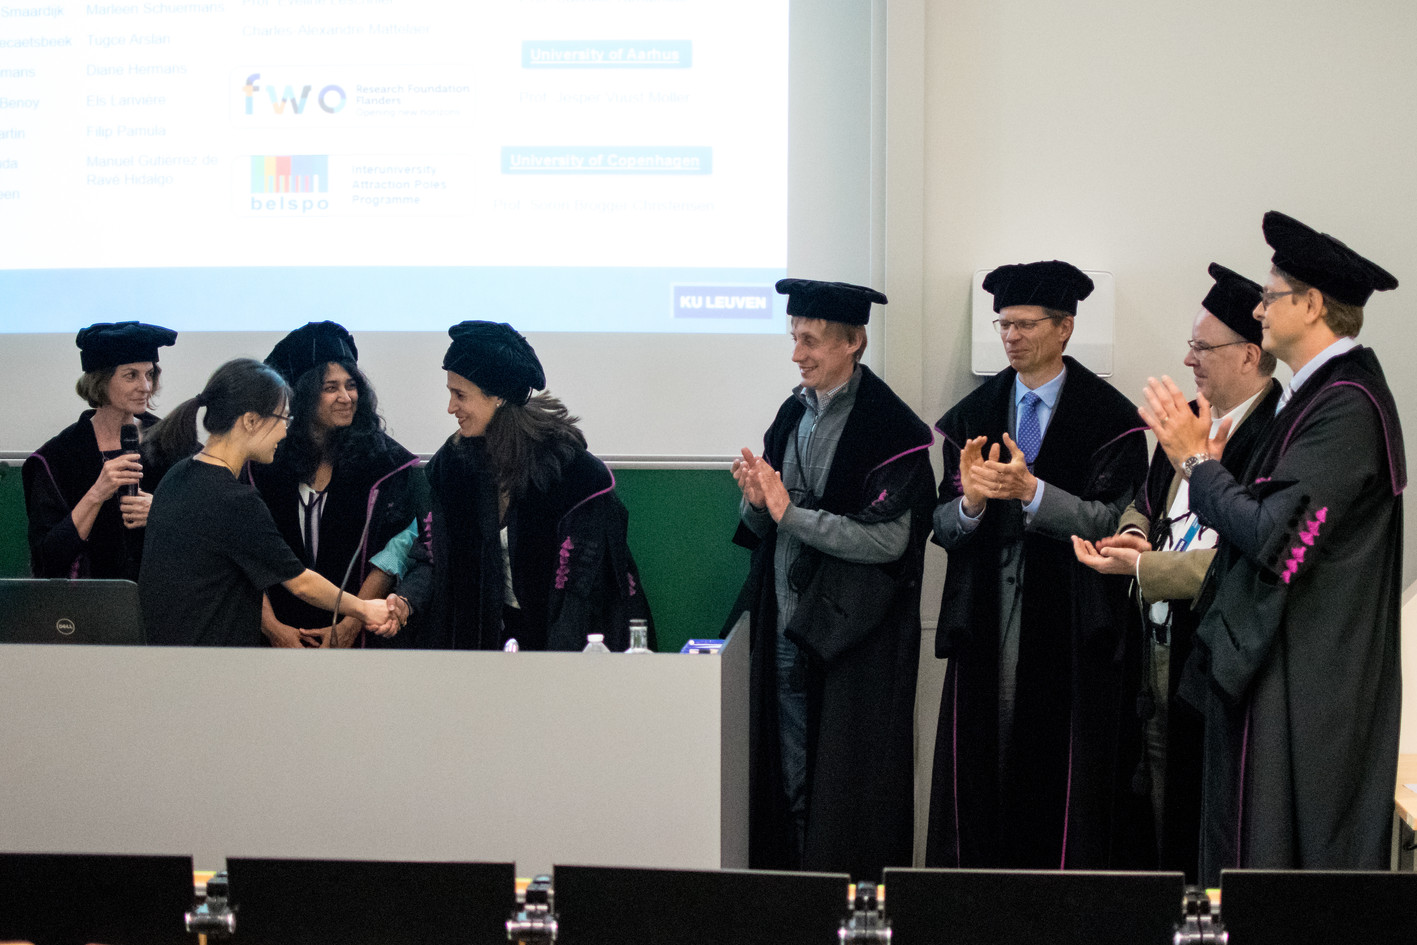 Jialin's PhD defense